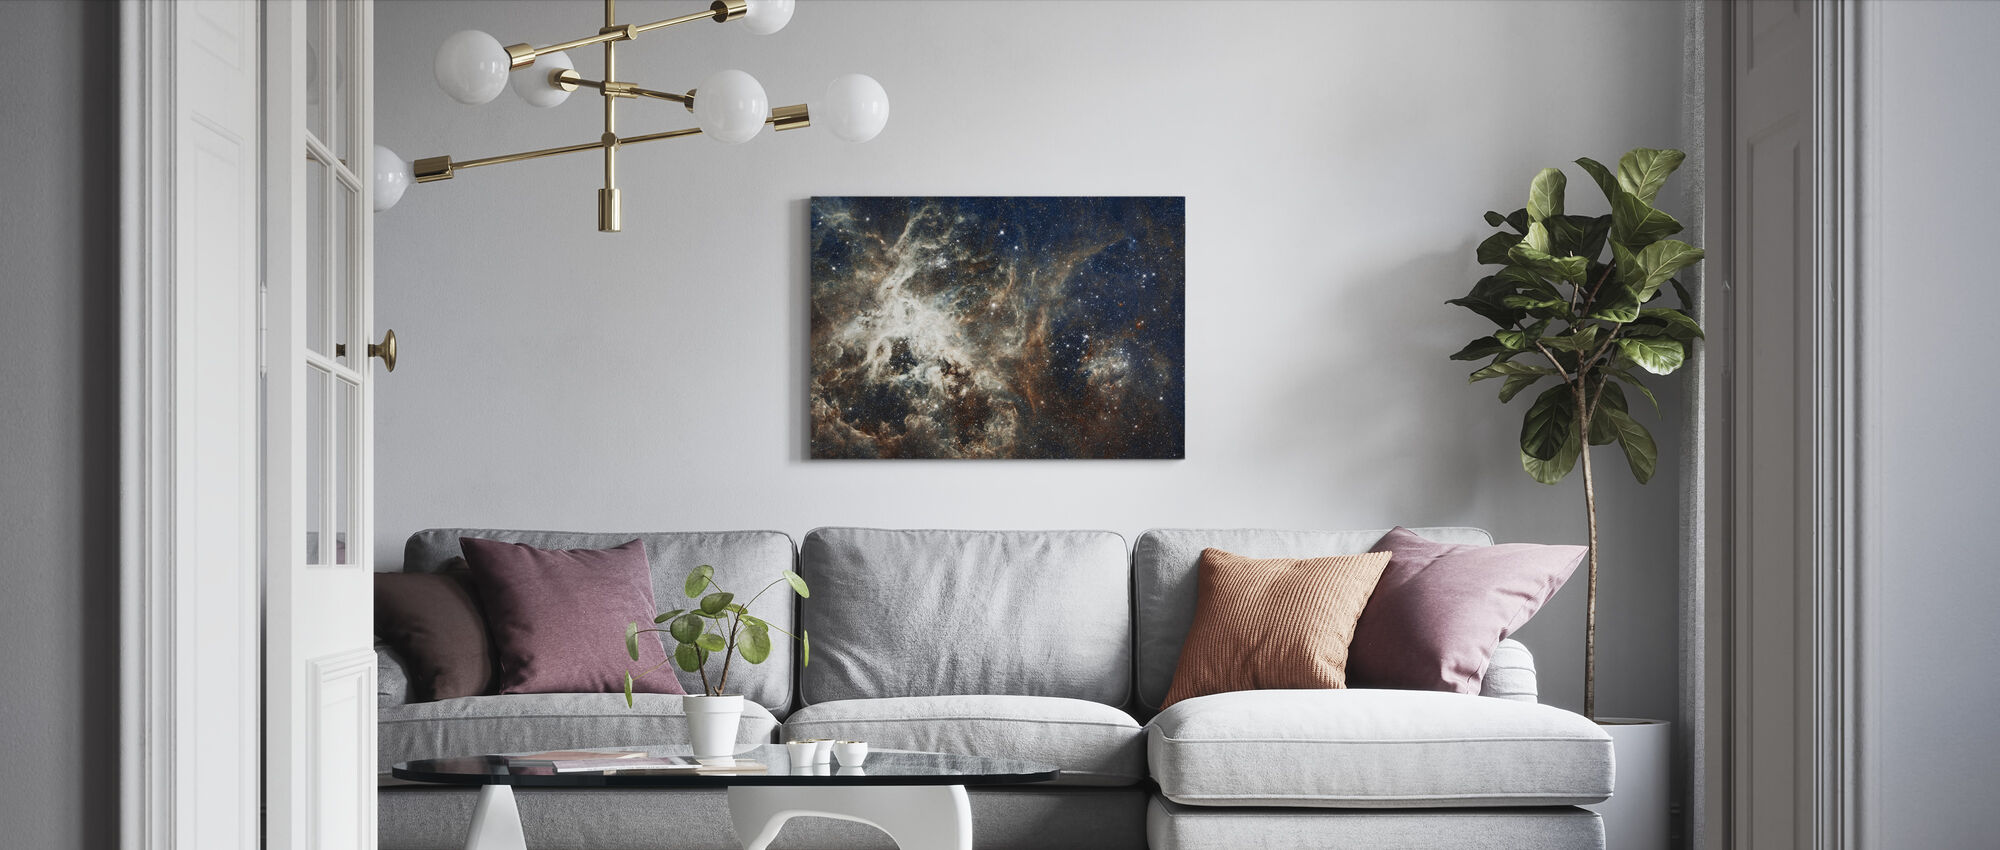 Galaxy - Canvas print - Living Room